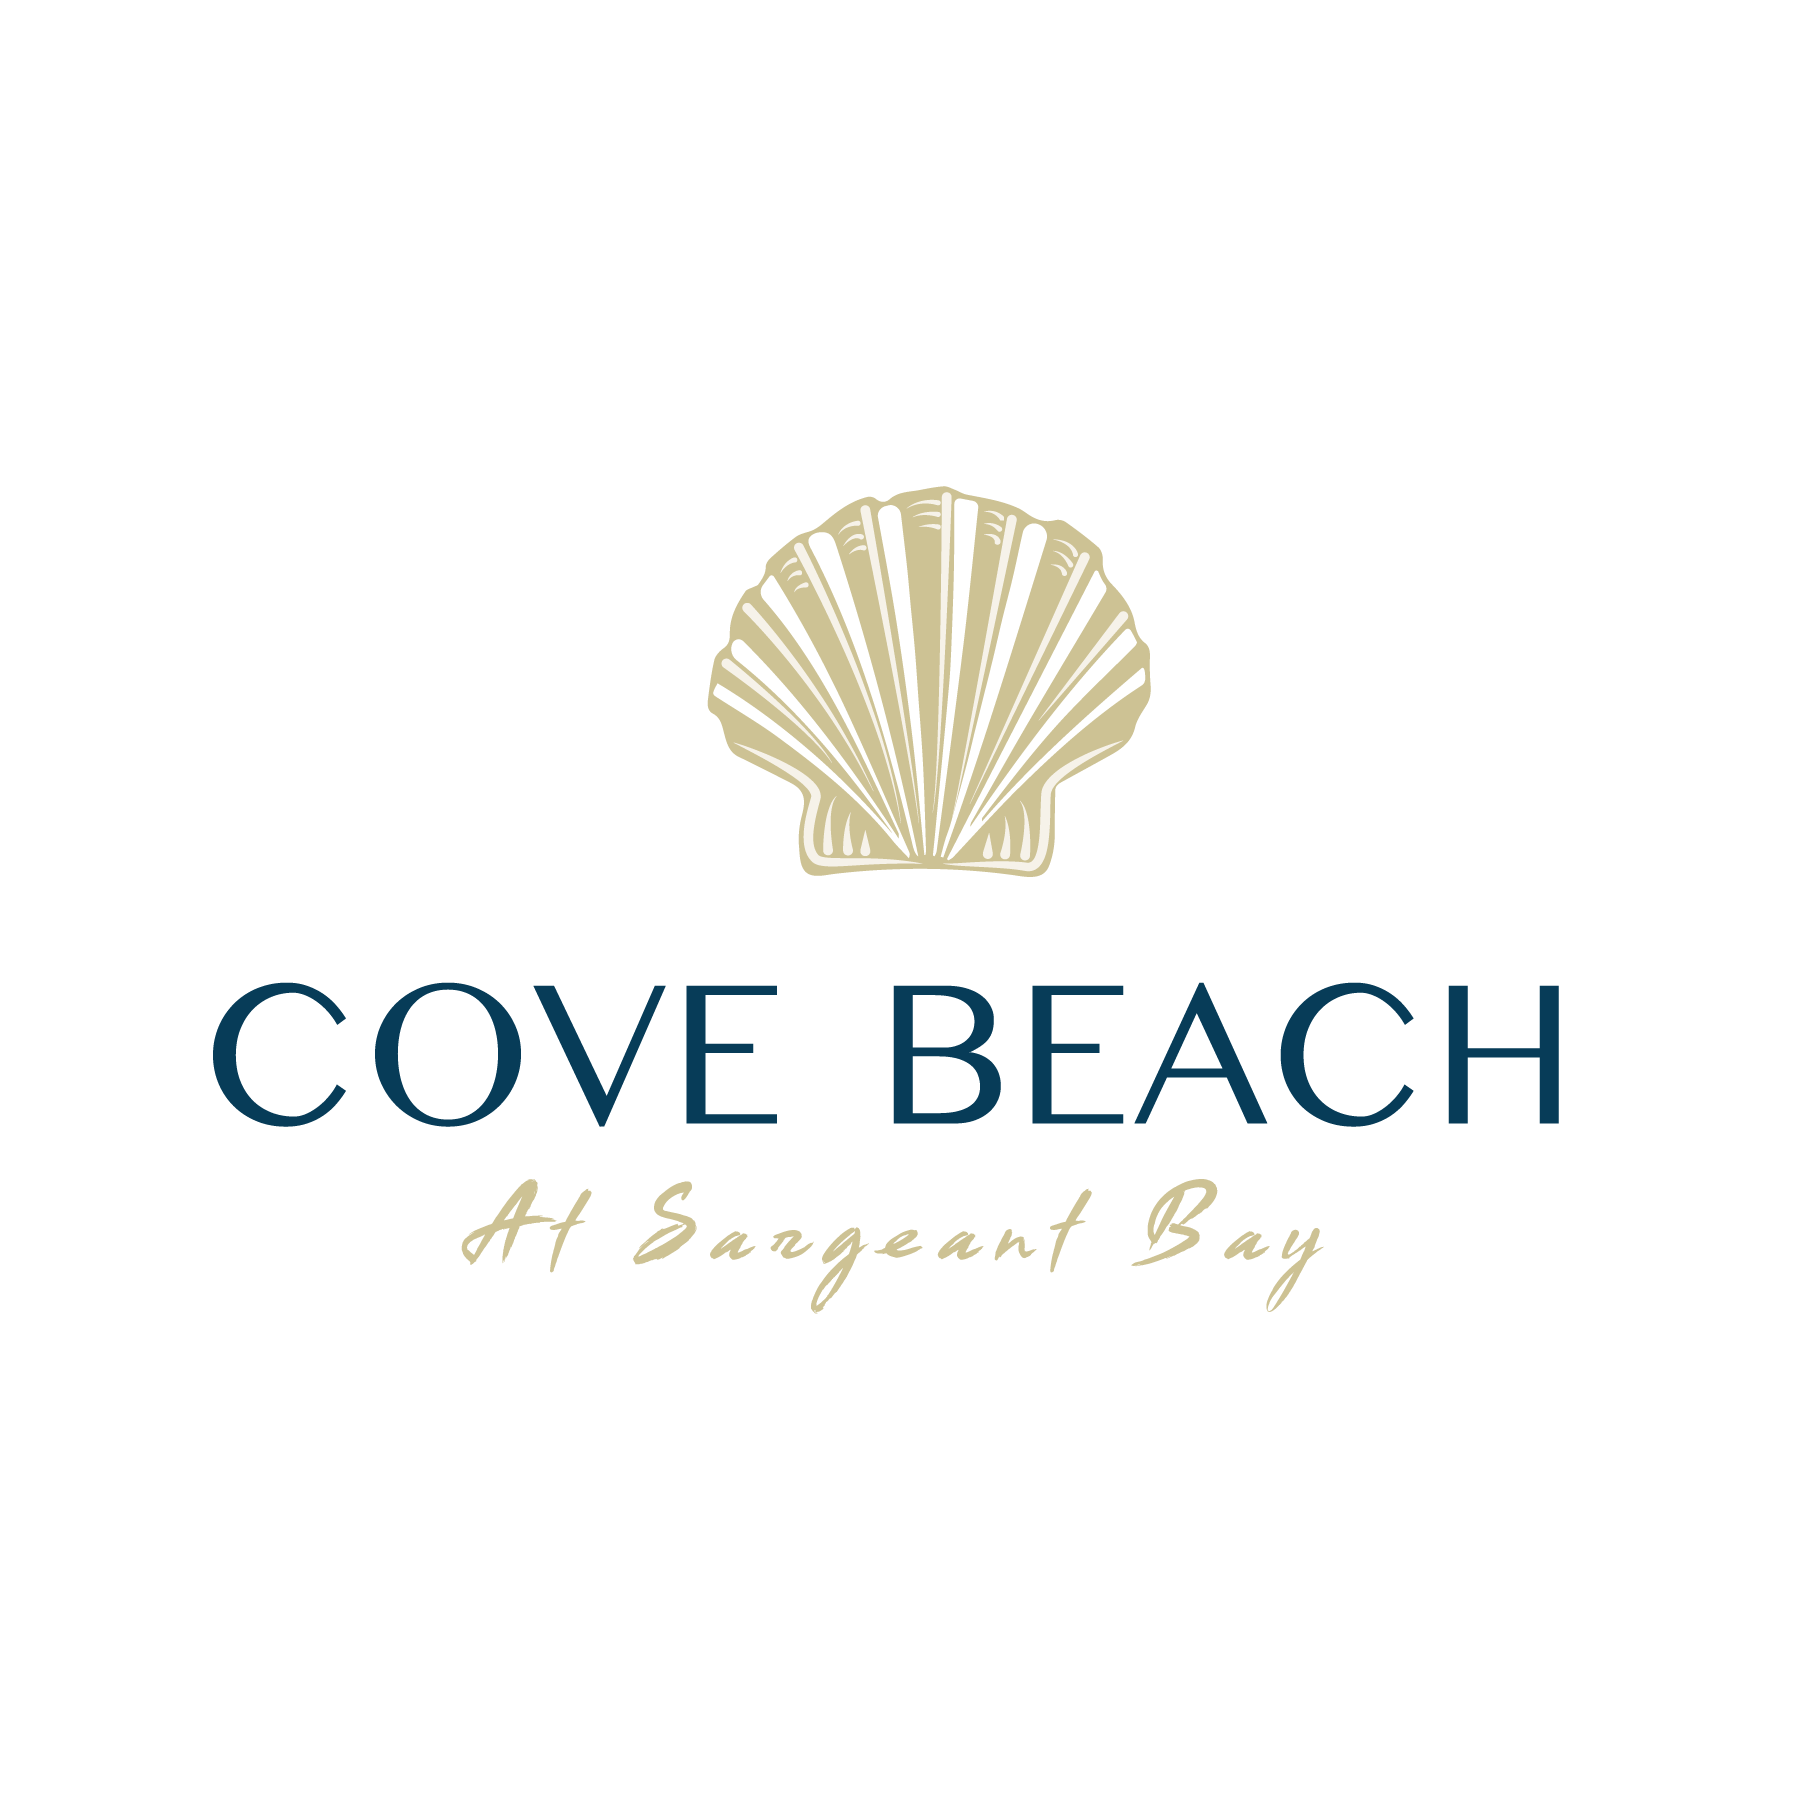 CoveBeachLogo-02.png